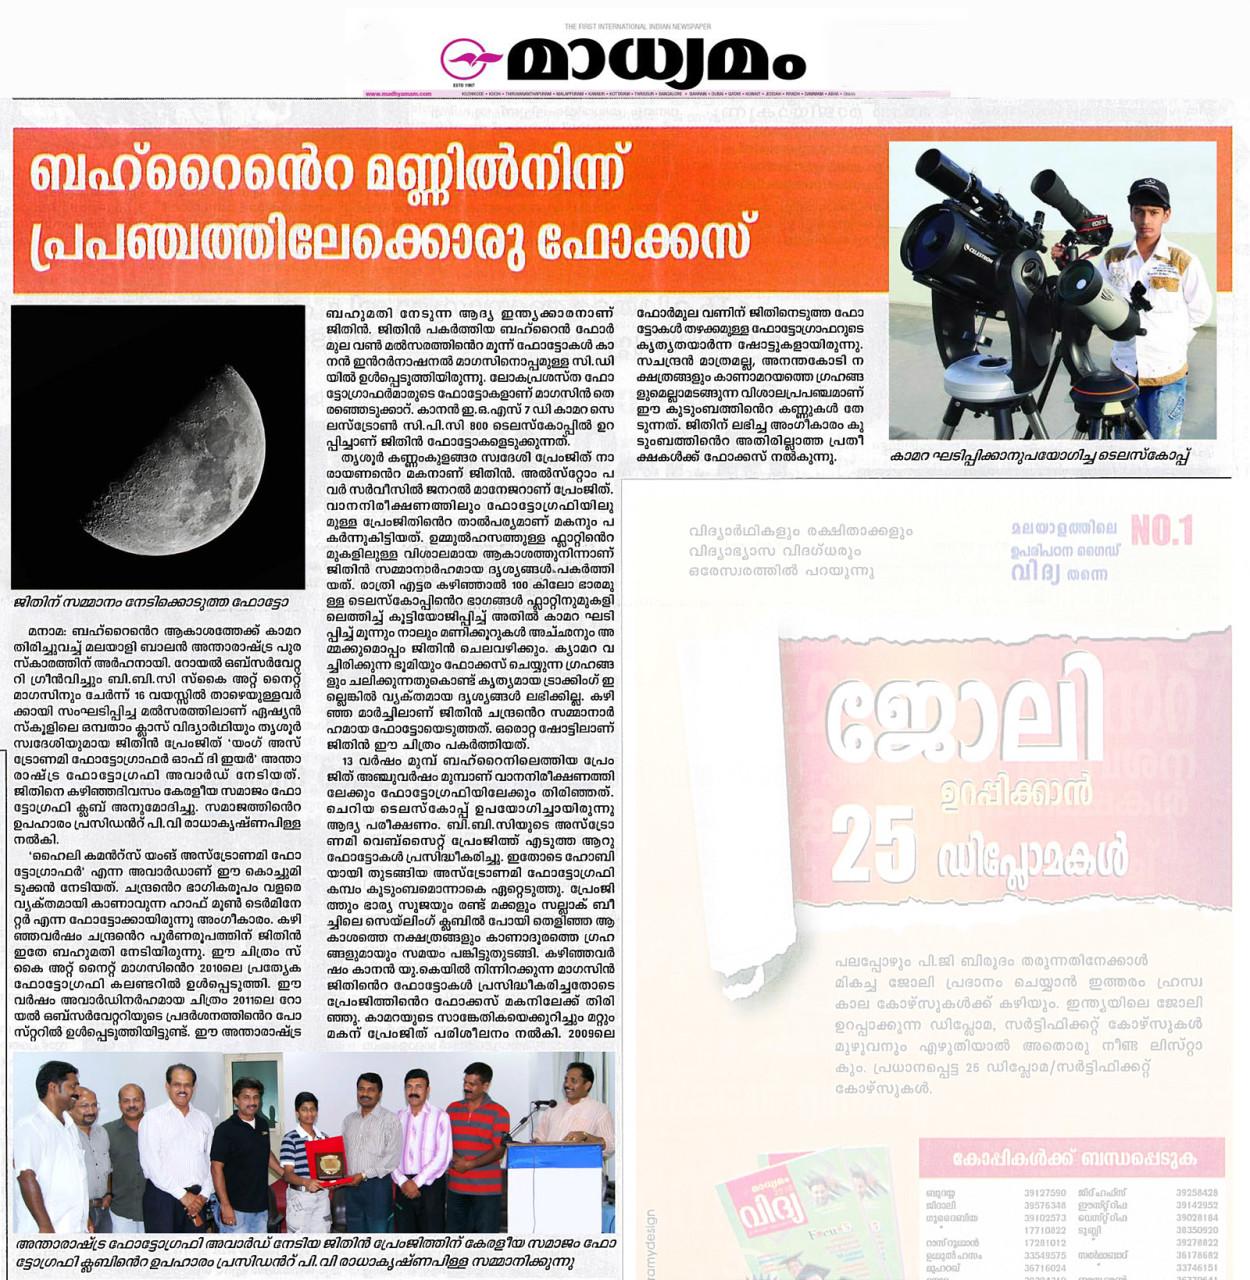 14.Madhyamam-12th-Oct-2010-a copy